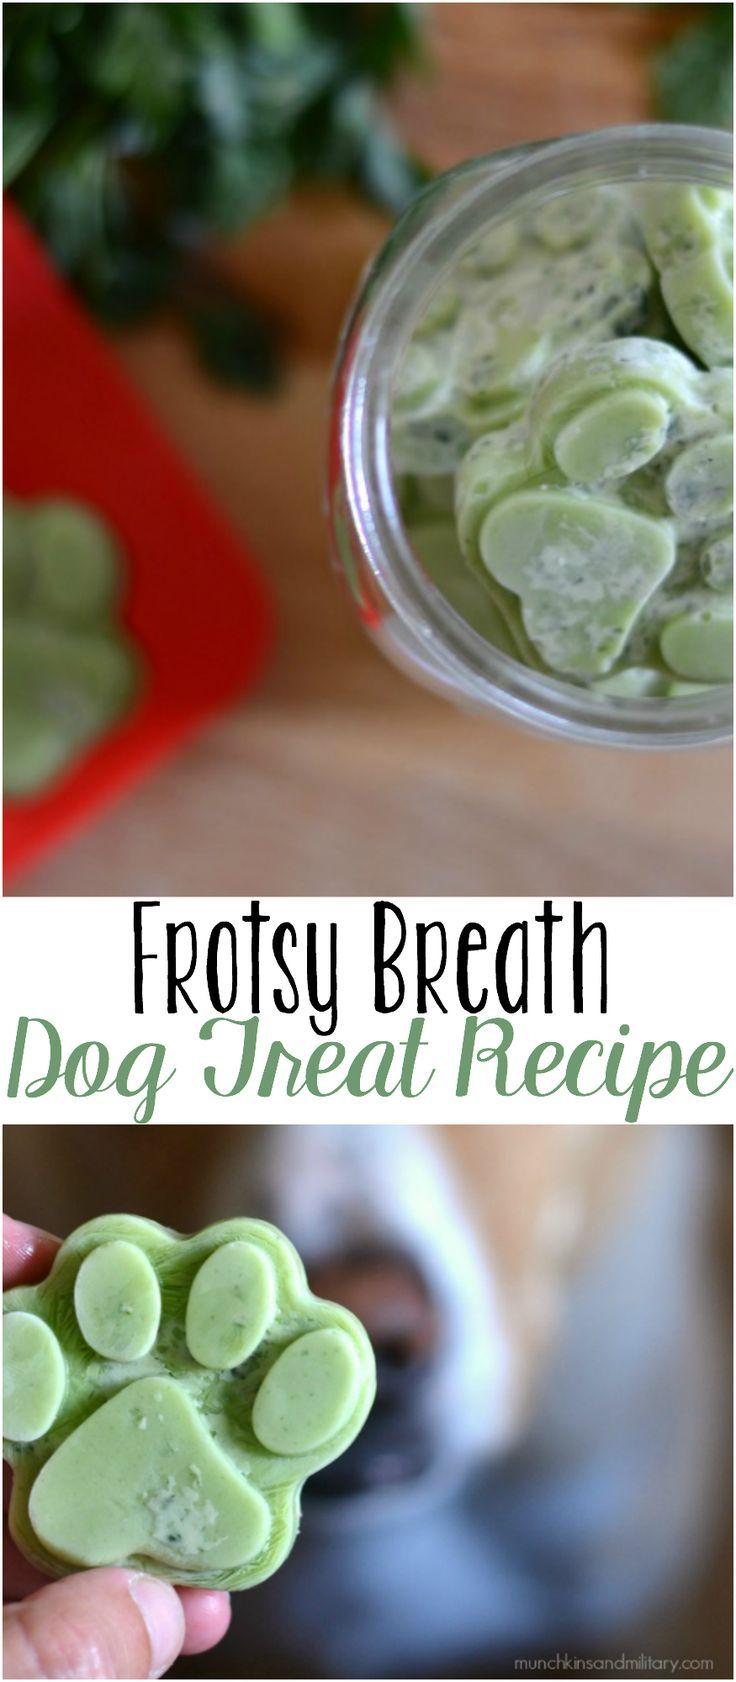 Frosty Breath Dog Treats A frozen dog treat with coconut oil and herbs to improve you dog's breath! http://munchkinsandmilitary.com/2017/07/frosty-breath-dog-treats.html?utm_content=buffer6cb97&utm_medium=social&utm_source=pinterest.com&utm_campaign=buffer | Munchkins and Military&utm_content=Frosty Breath Dog Treats